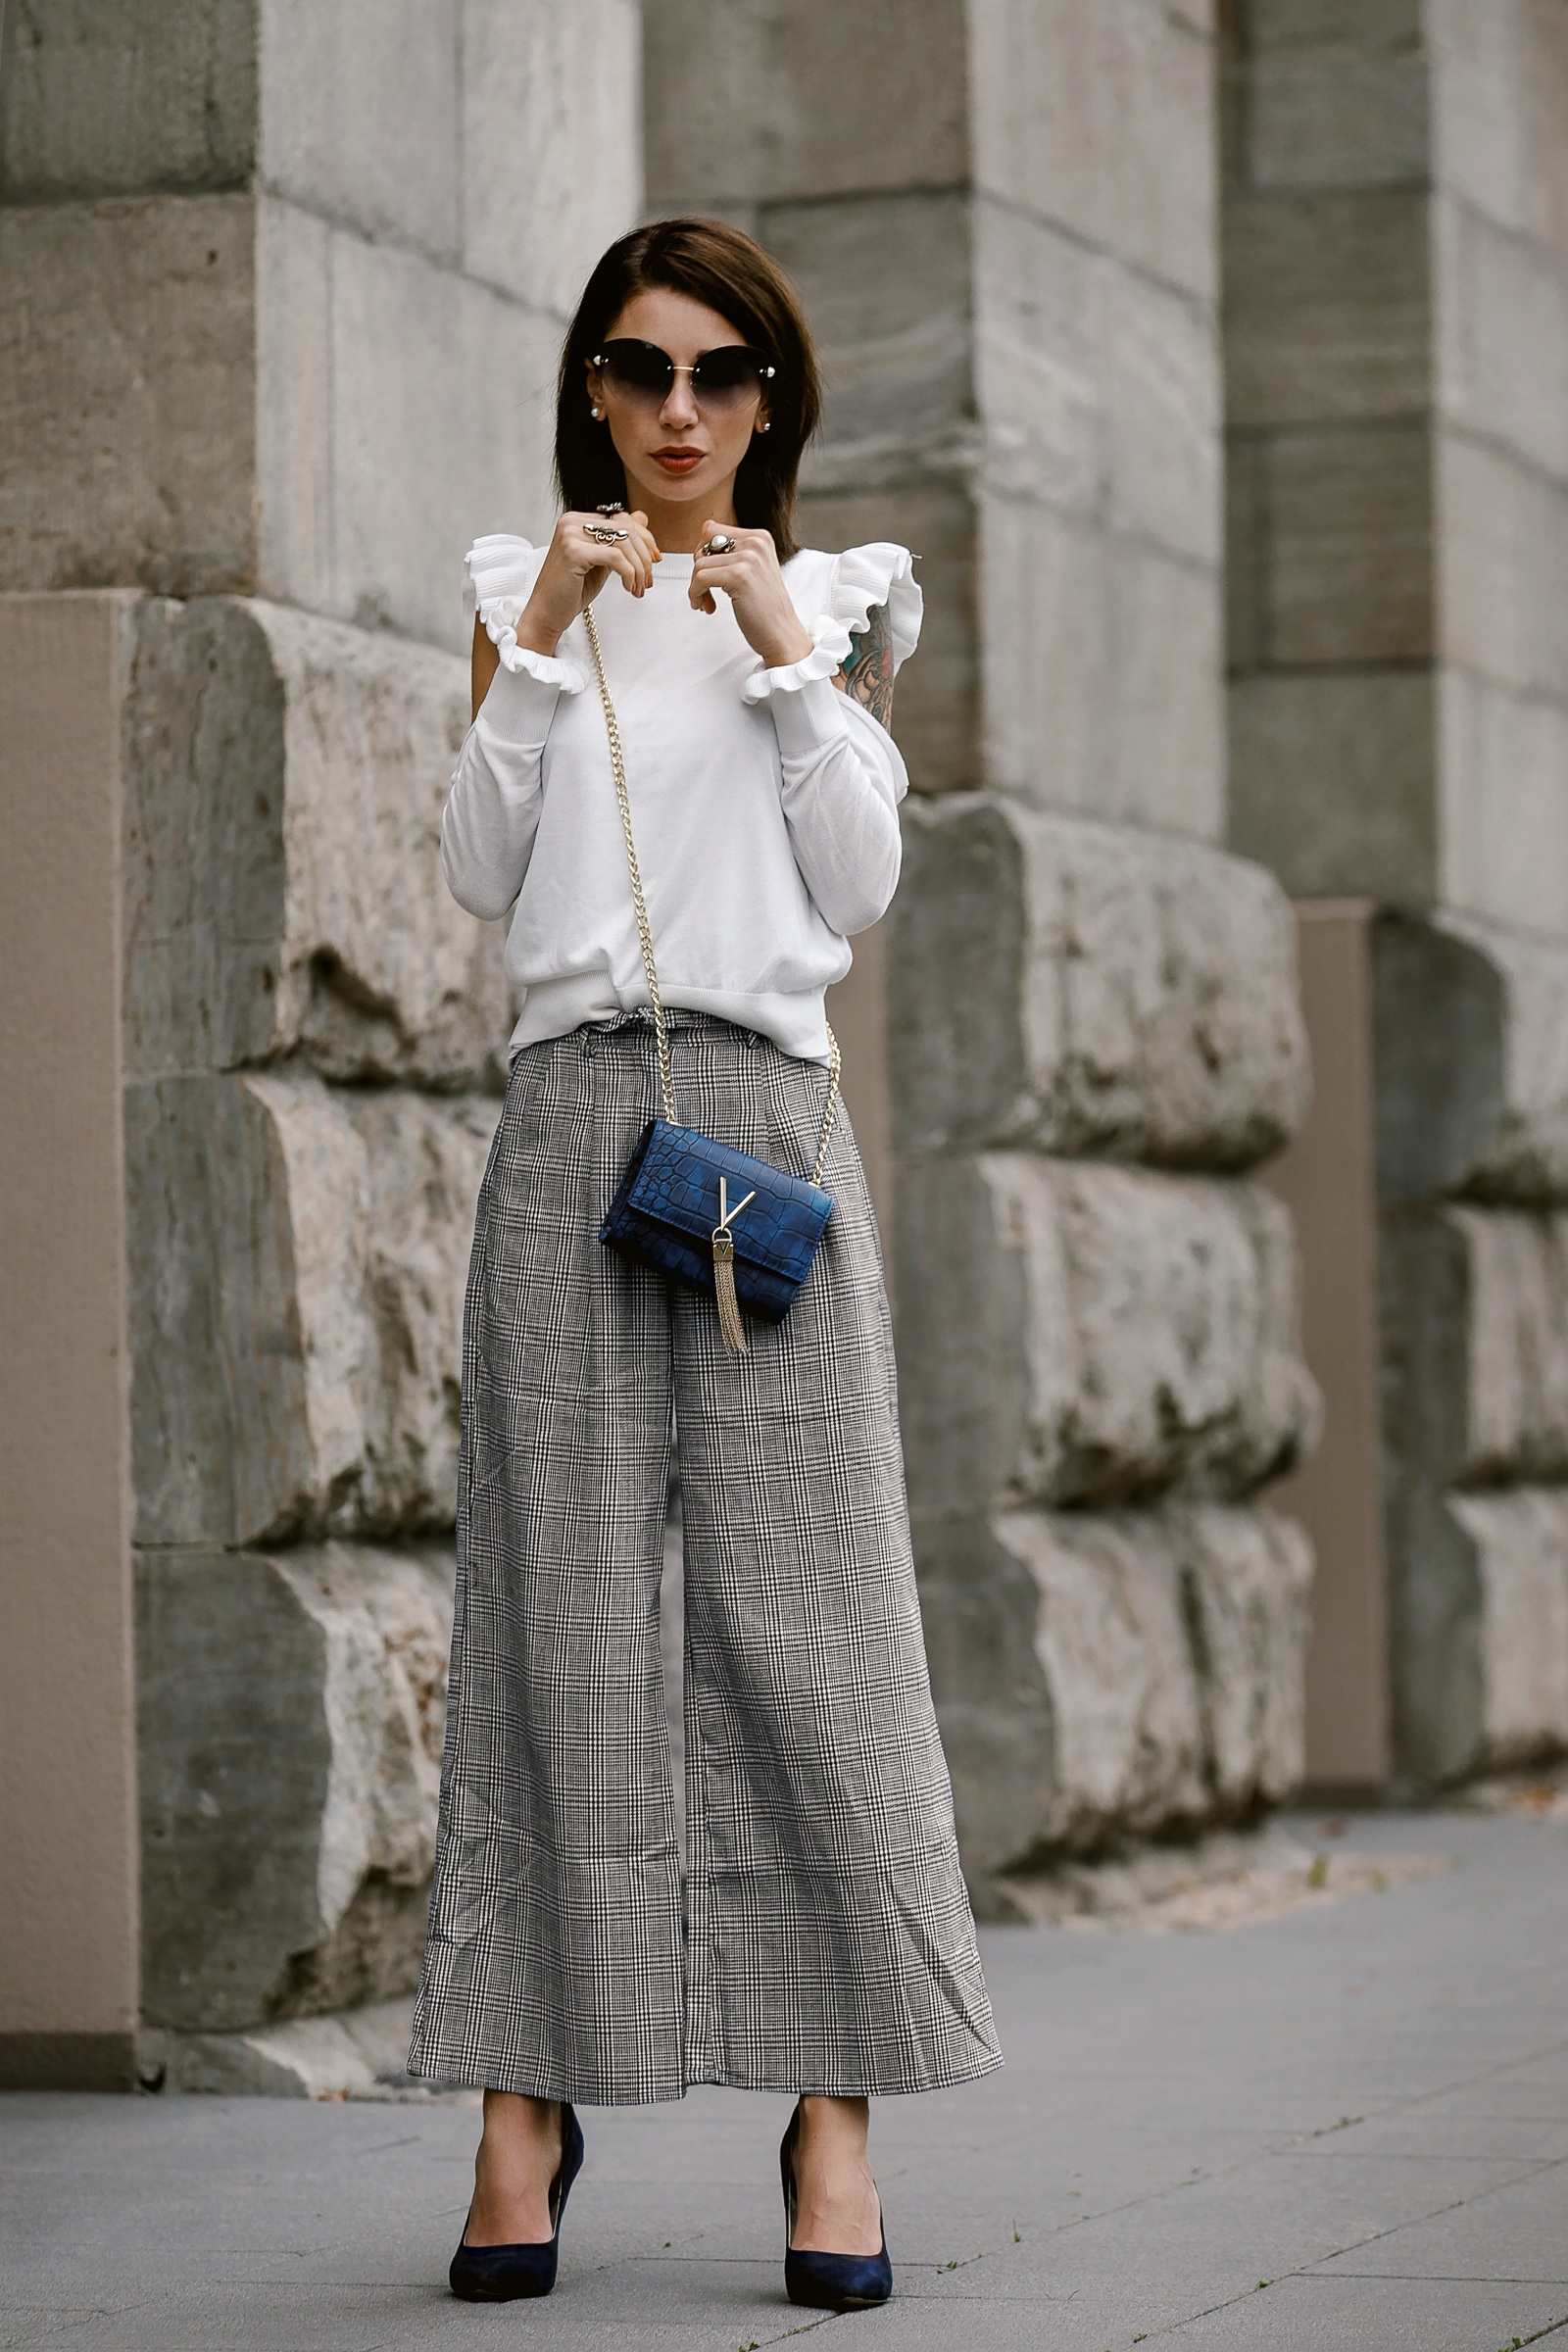 deutsche-mode-blogger-streetstyle-outfit-jasmin-kessler-fashion-look-2017